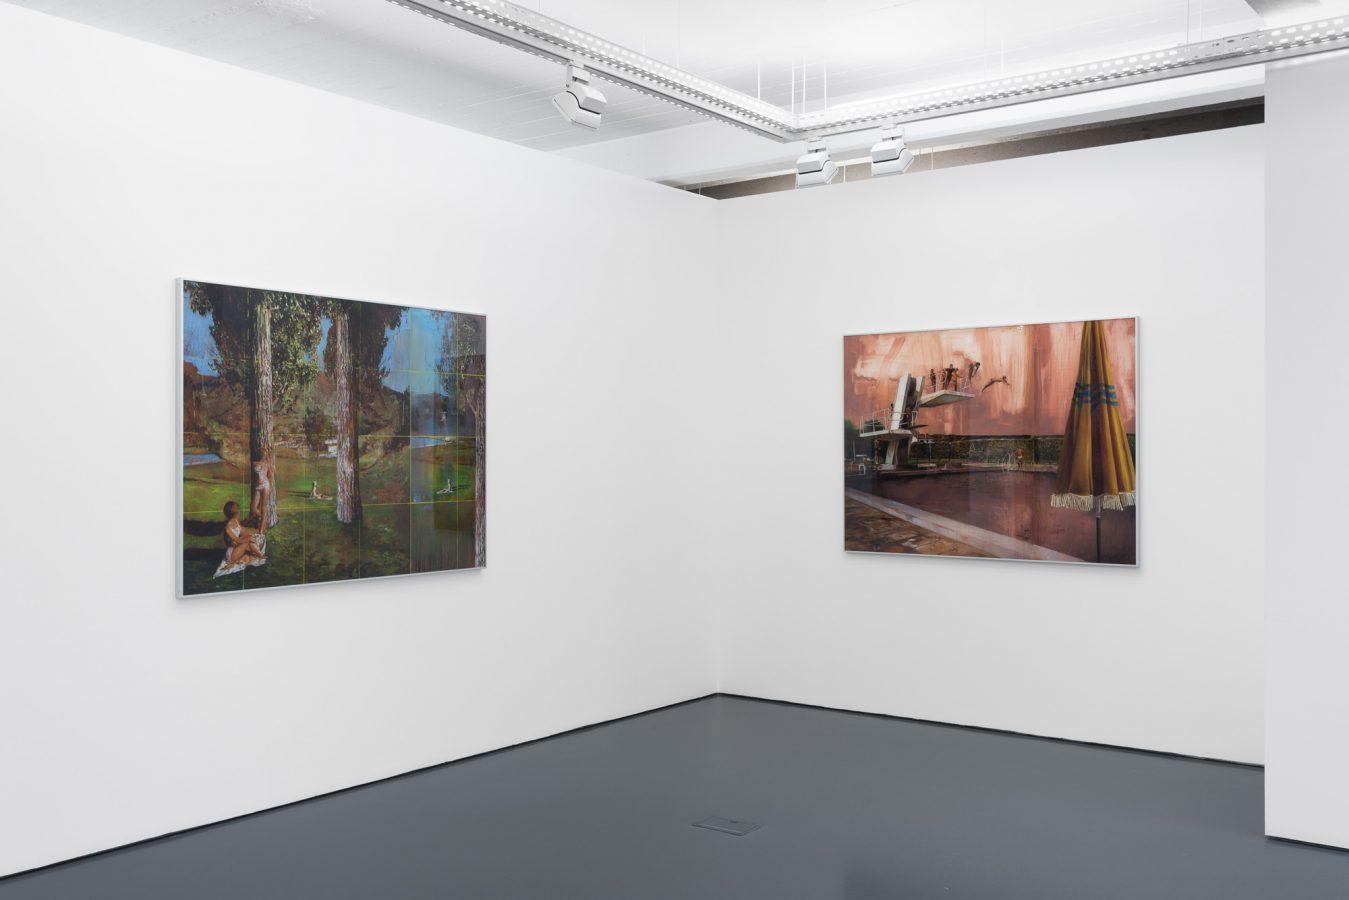 Galeria Pedro Cera –  Gil Heitor Cortesão - Lost Summer